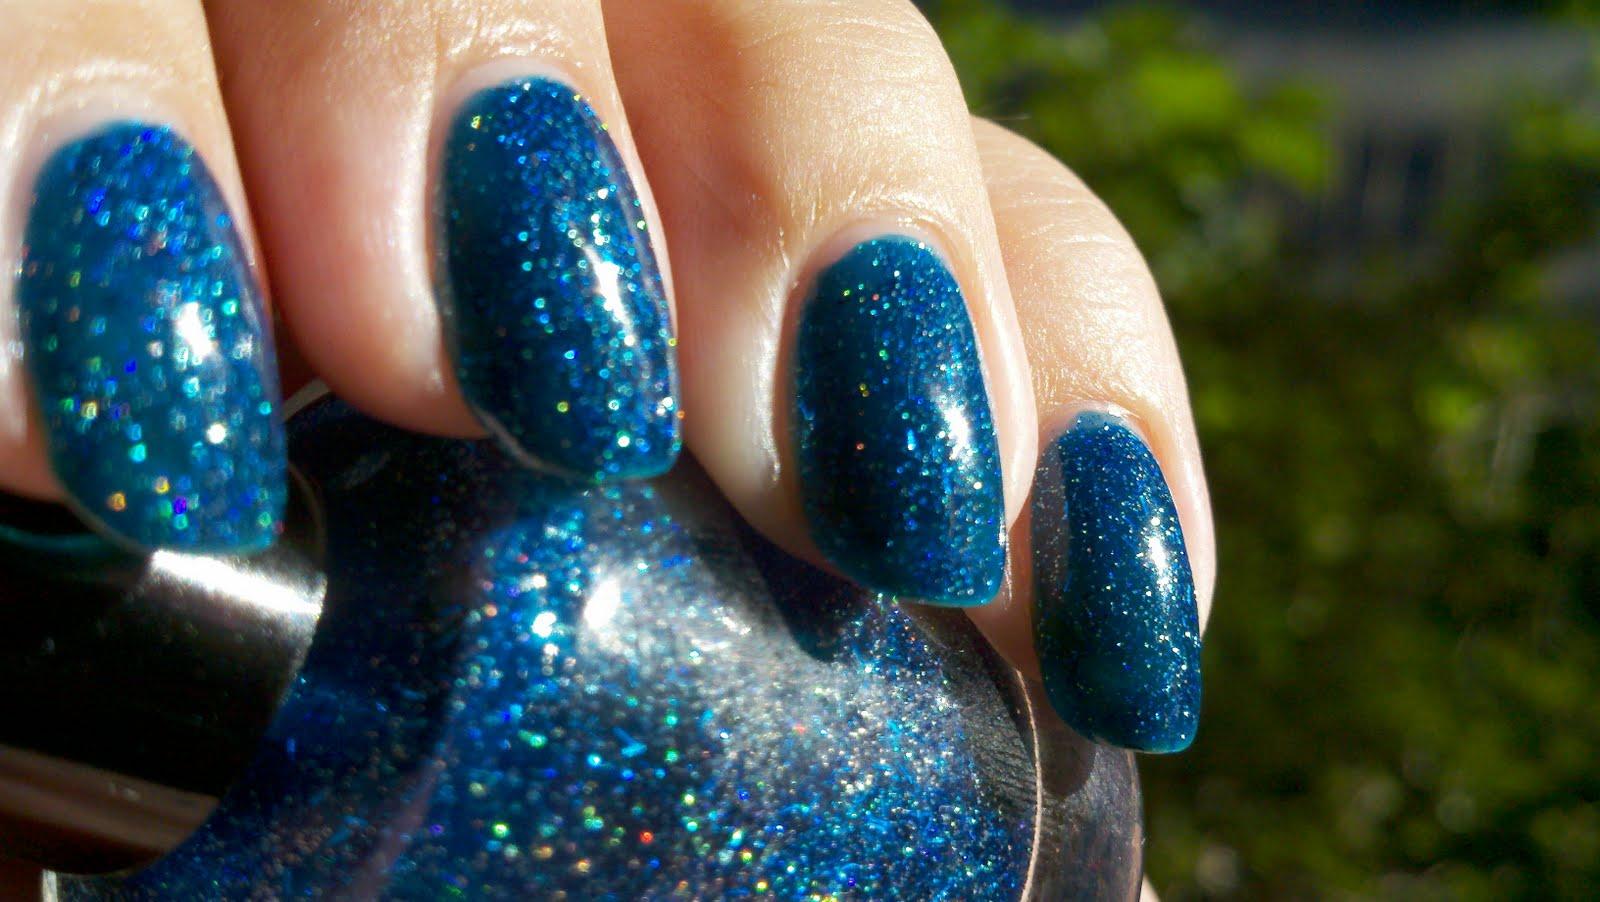 polish insomniac: Blue Jelly Glitter Holo Franken